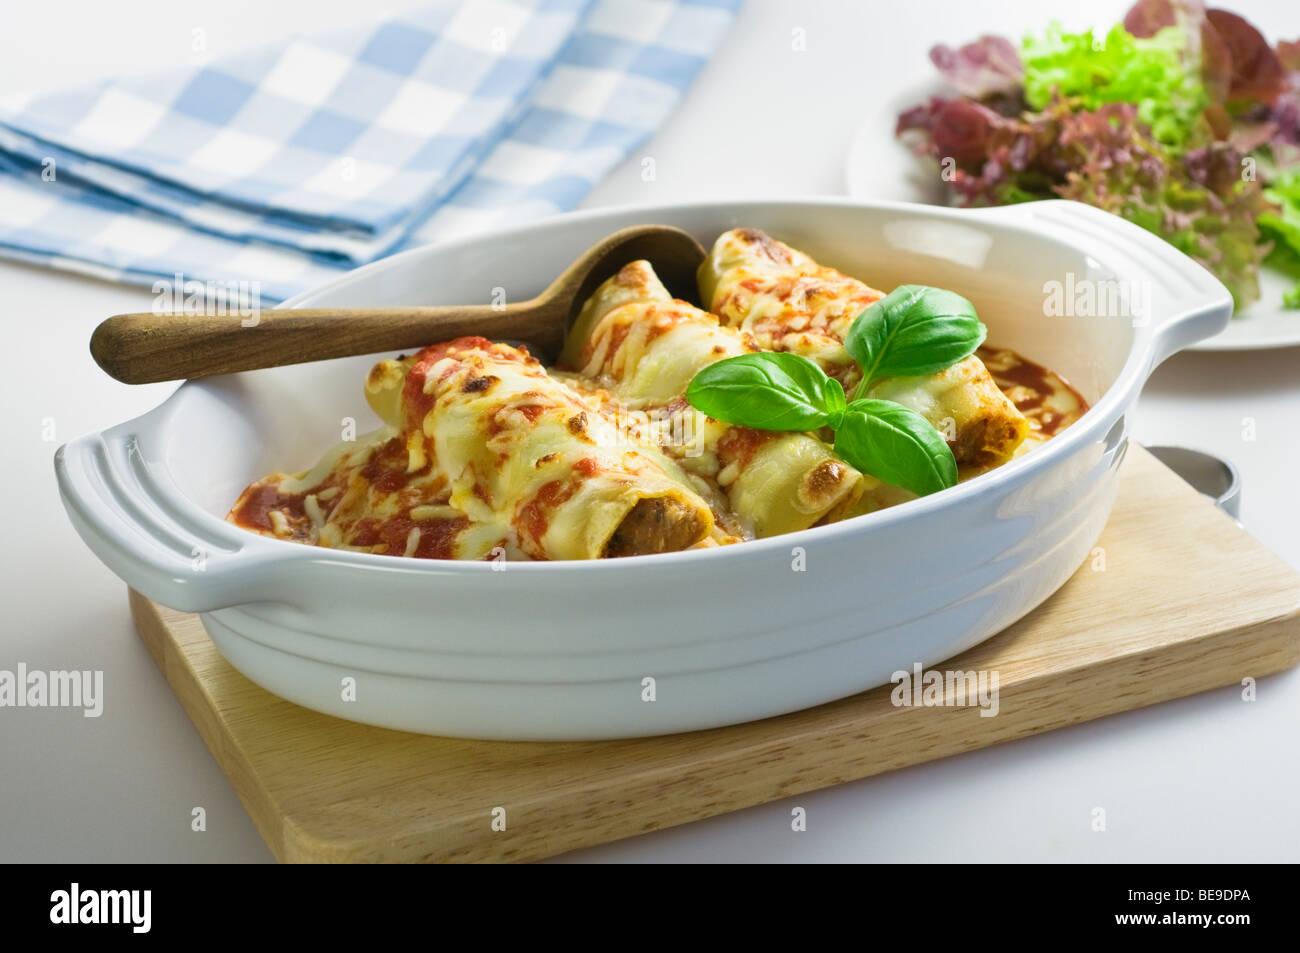 Canelones Comida Italiana Italia Imagen De Stock